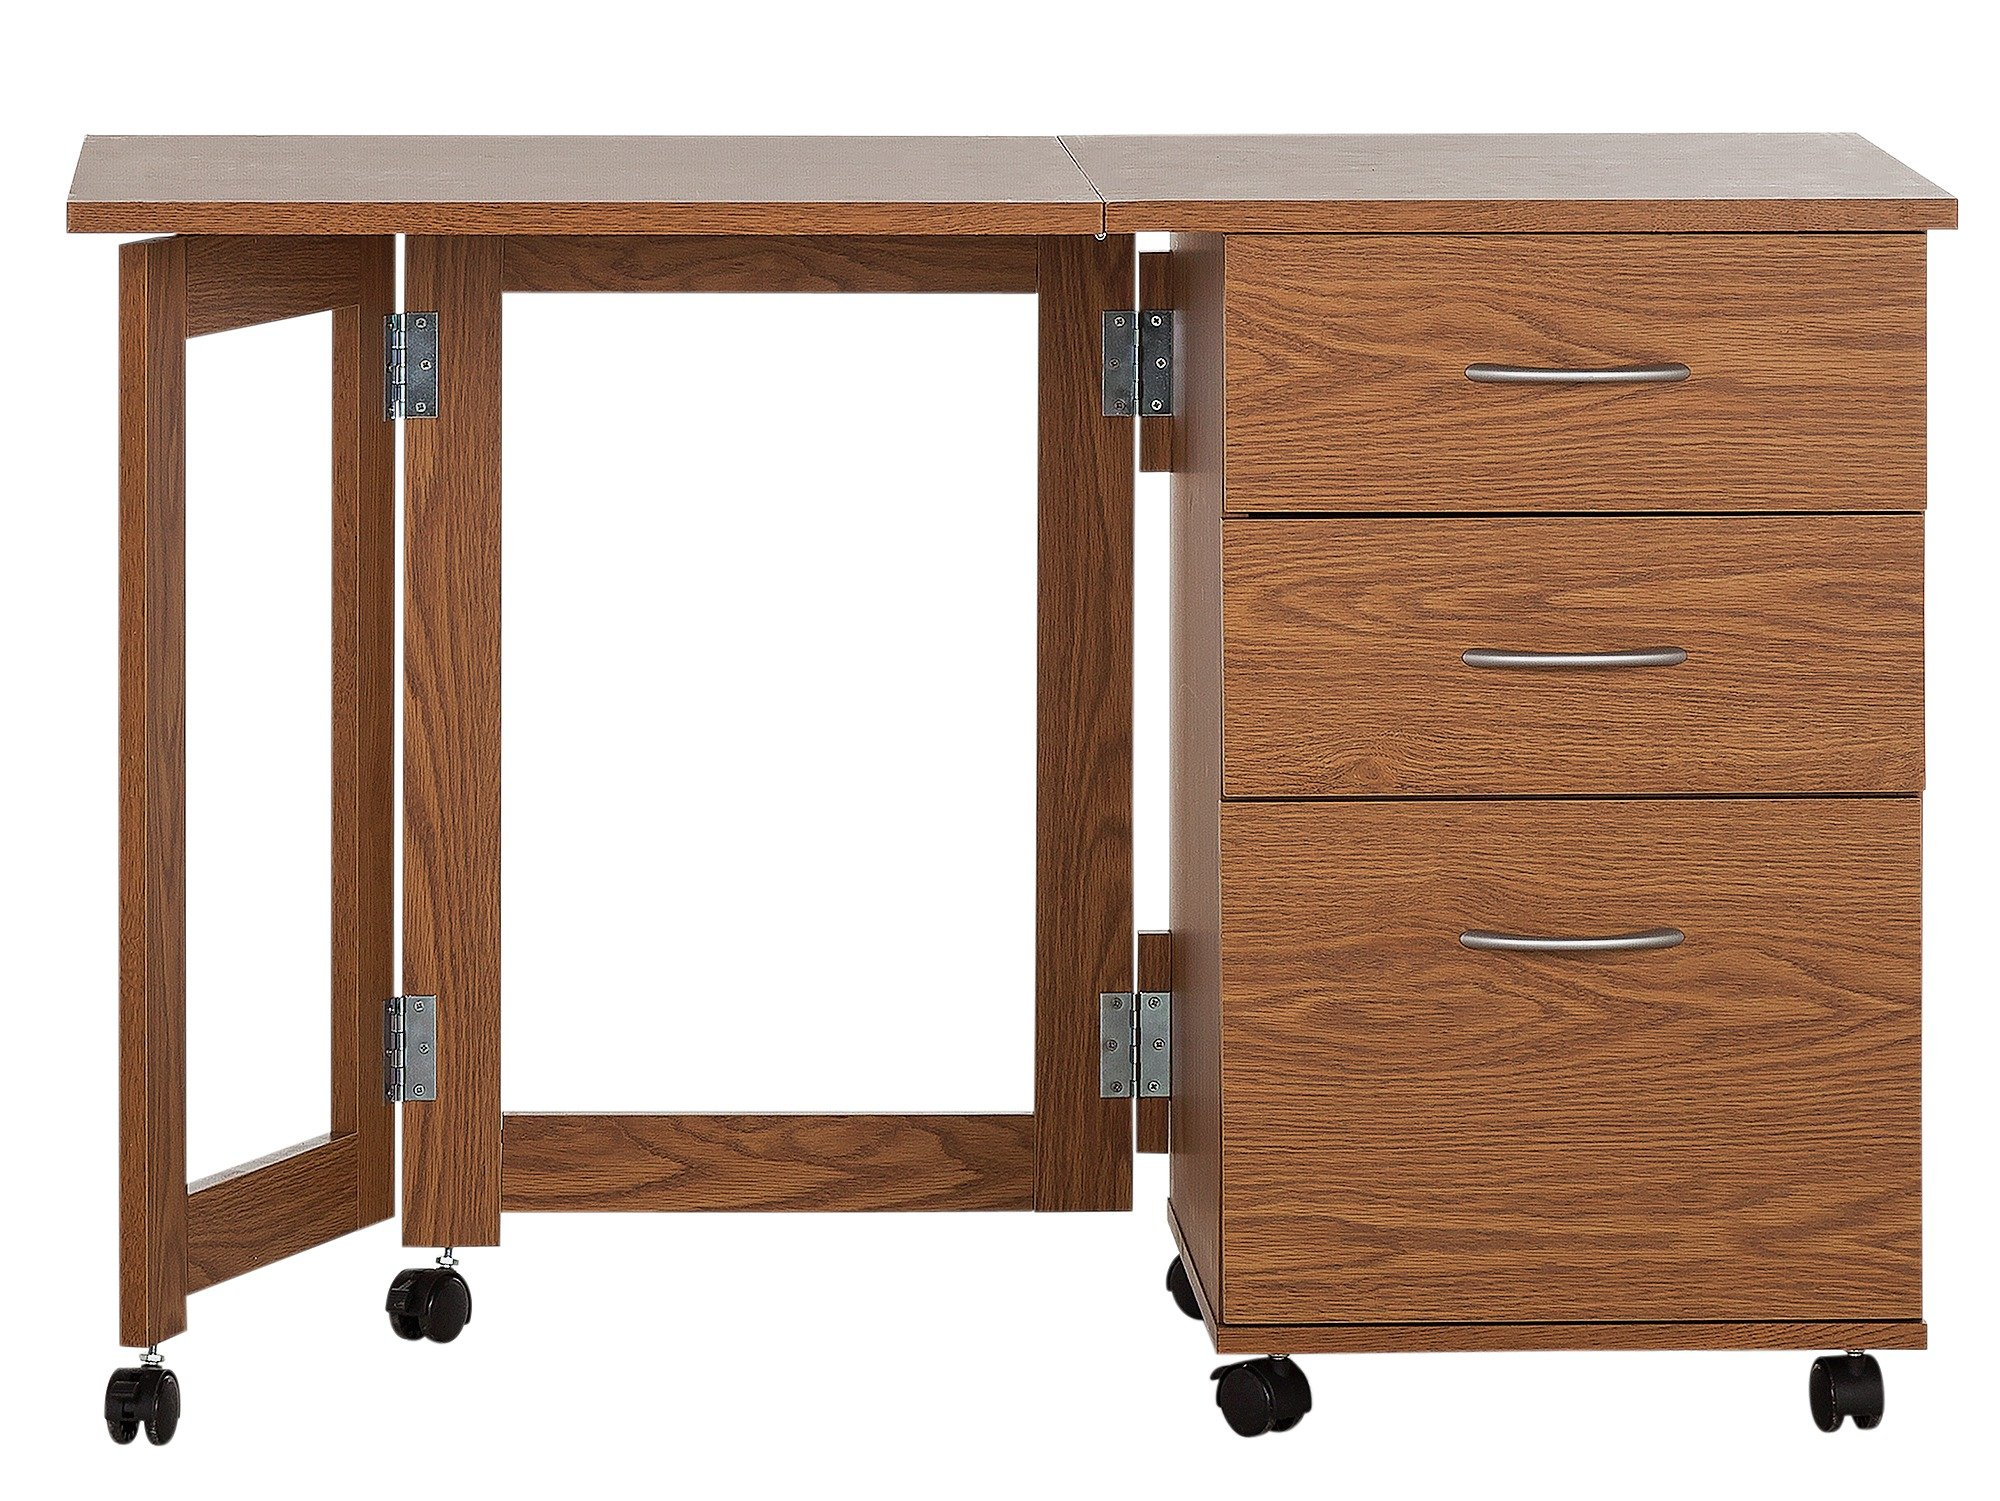 space saving office desk. home dino 2 drawer space saving office desk oak effect a